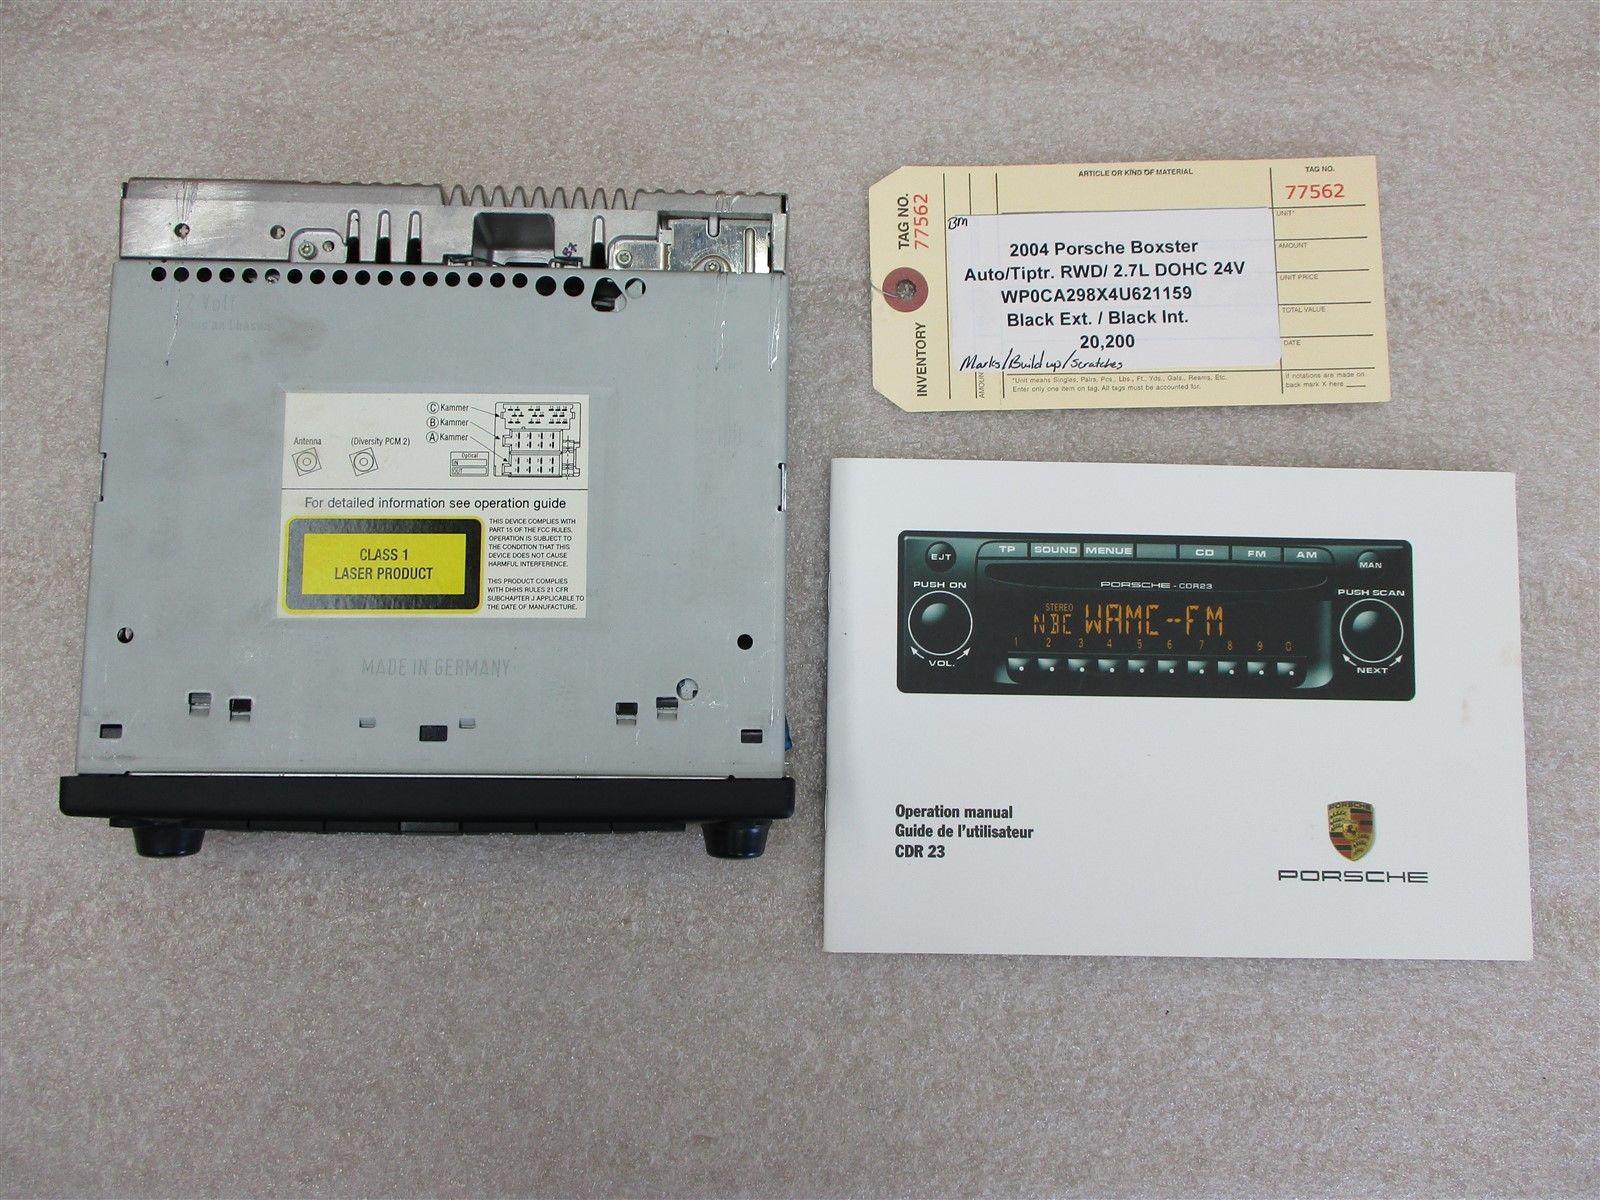 04 boxster rwd porsche 986 radio tuner cd player cdr23 99664512805 20 200 [ 1600 x 1200 Pixel ]